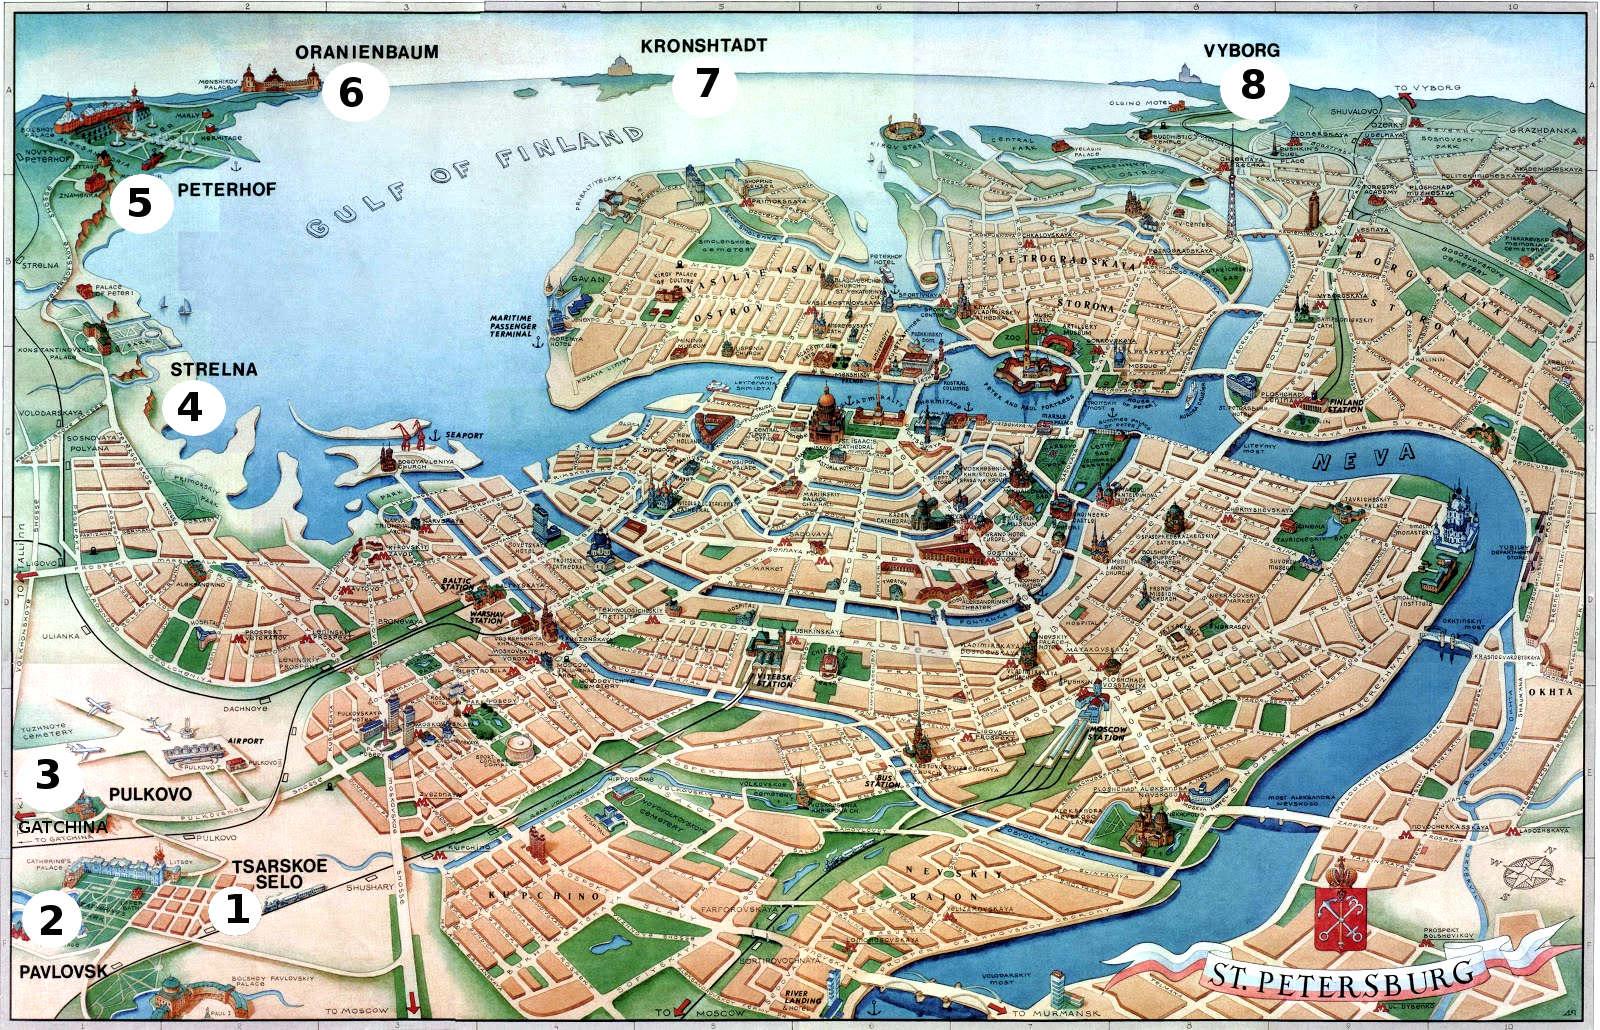 Map of St.Petersburg royal suburbs; 1 - Tsarskoye Selo (Pushkin); 2 - Pavlovsk; 3 - Gatchina; 4 - Strelna; 5 - Peterhof; 6 - Oranienbaum; 7 - Kronstadt; 8 - Vyborg.